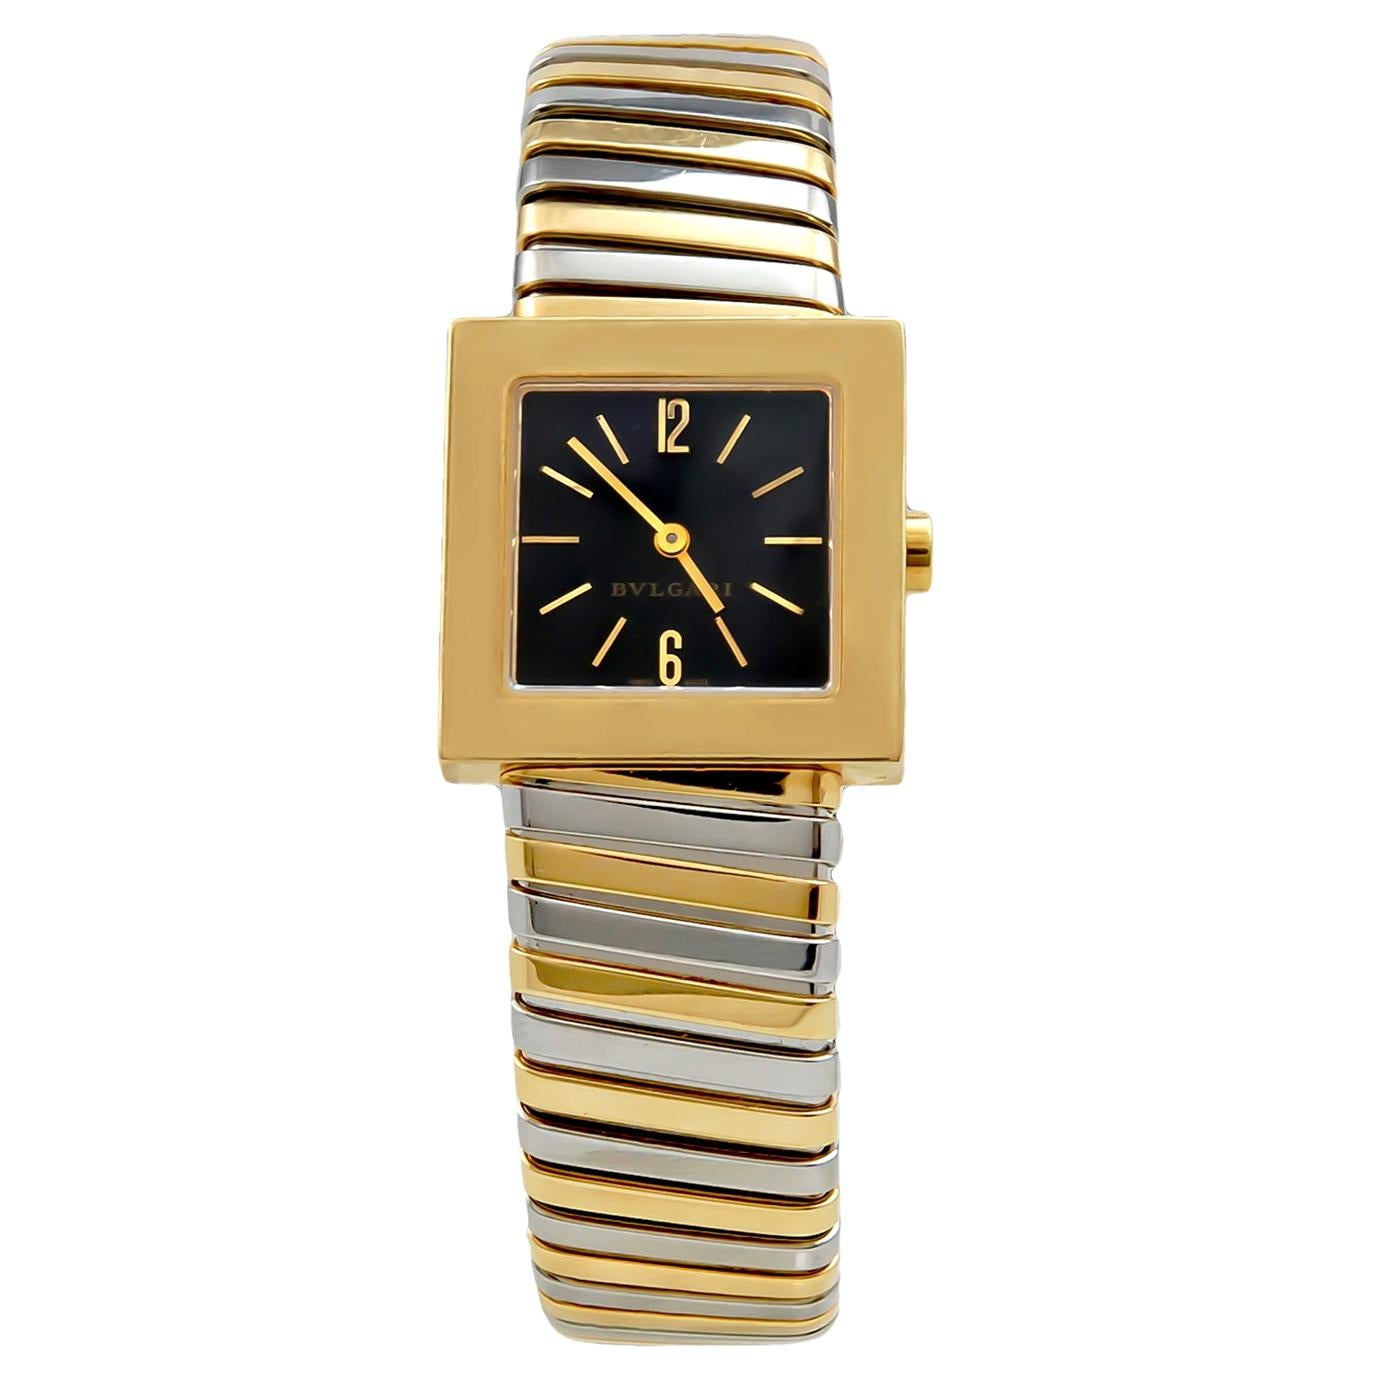 BULGARI Tubogas 22mm Quadrato Tri-Color Watch